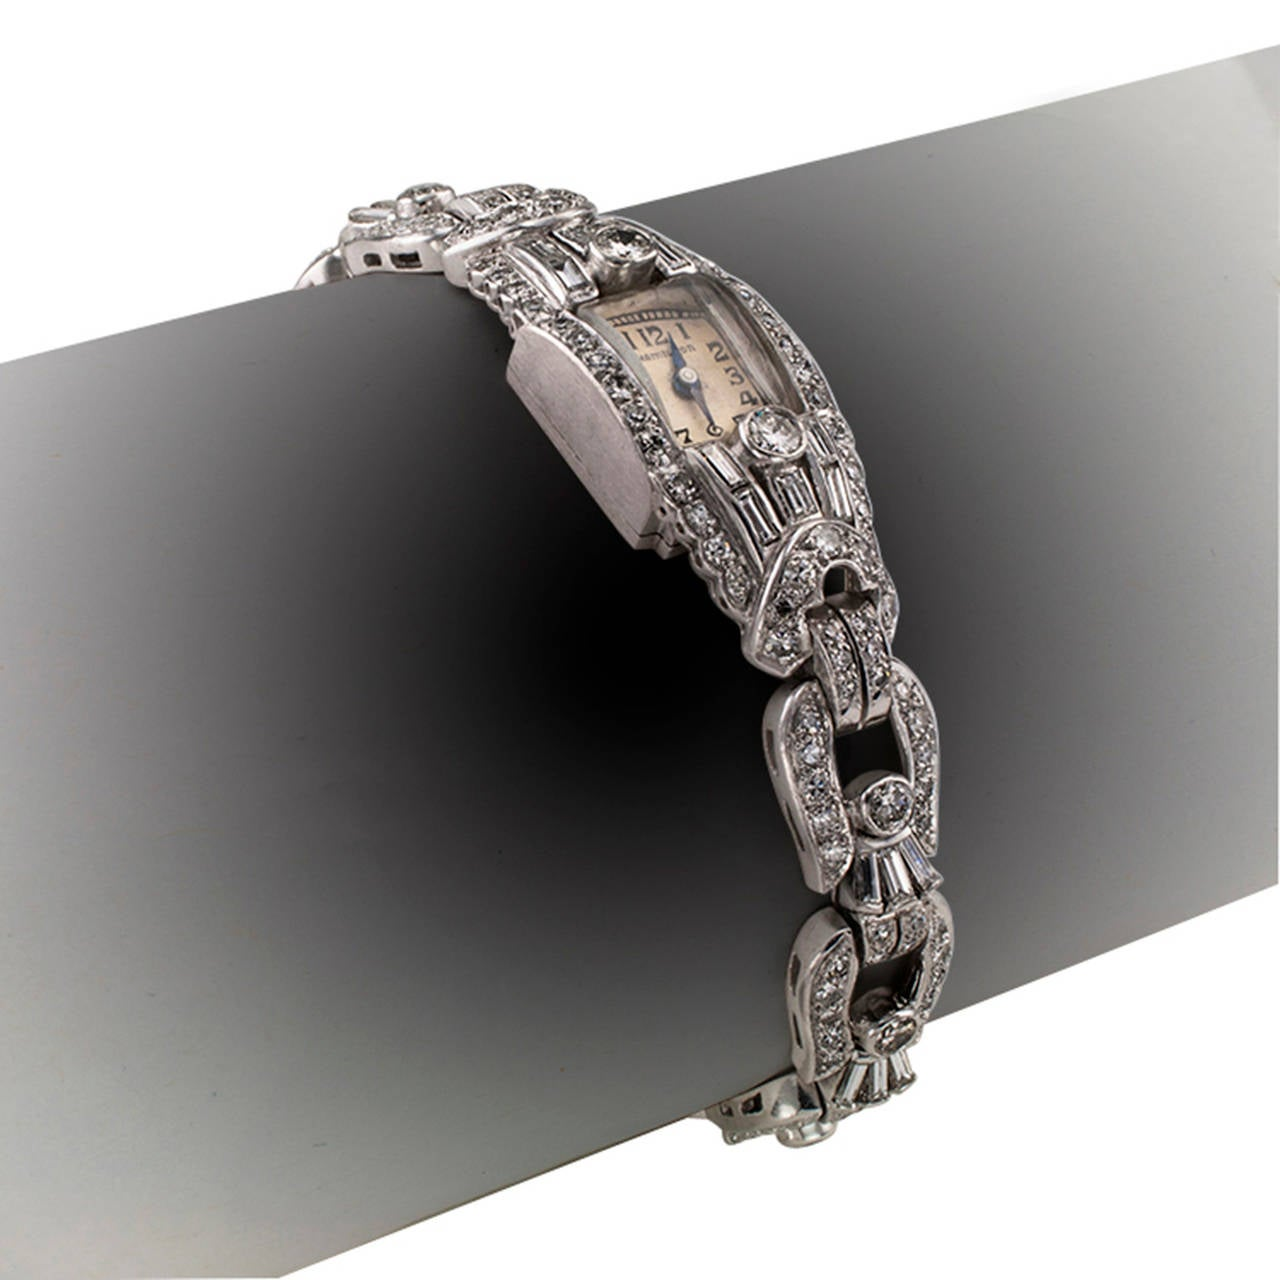 Hamilton Ladies Platinum Diamond Wristwatch 2